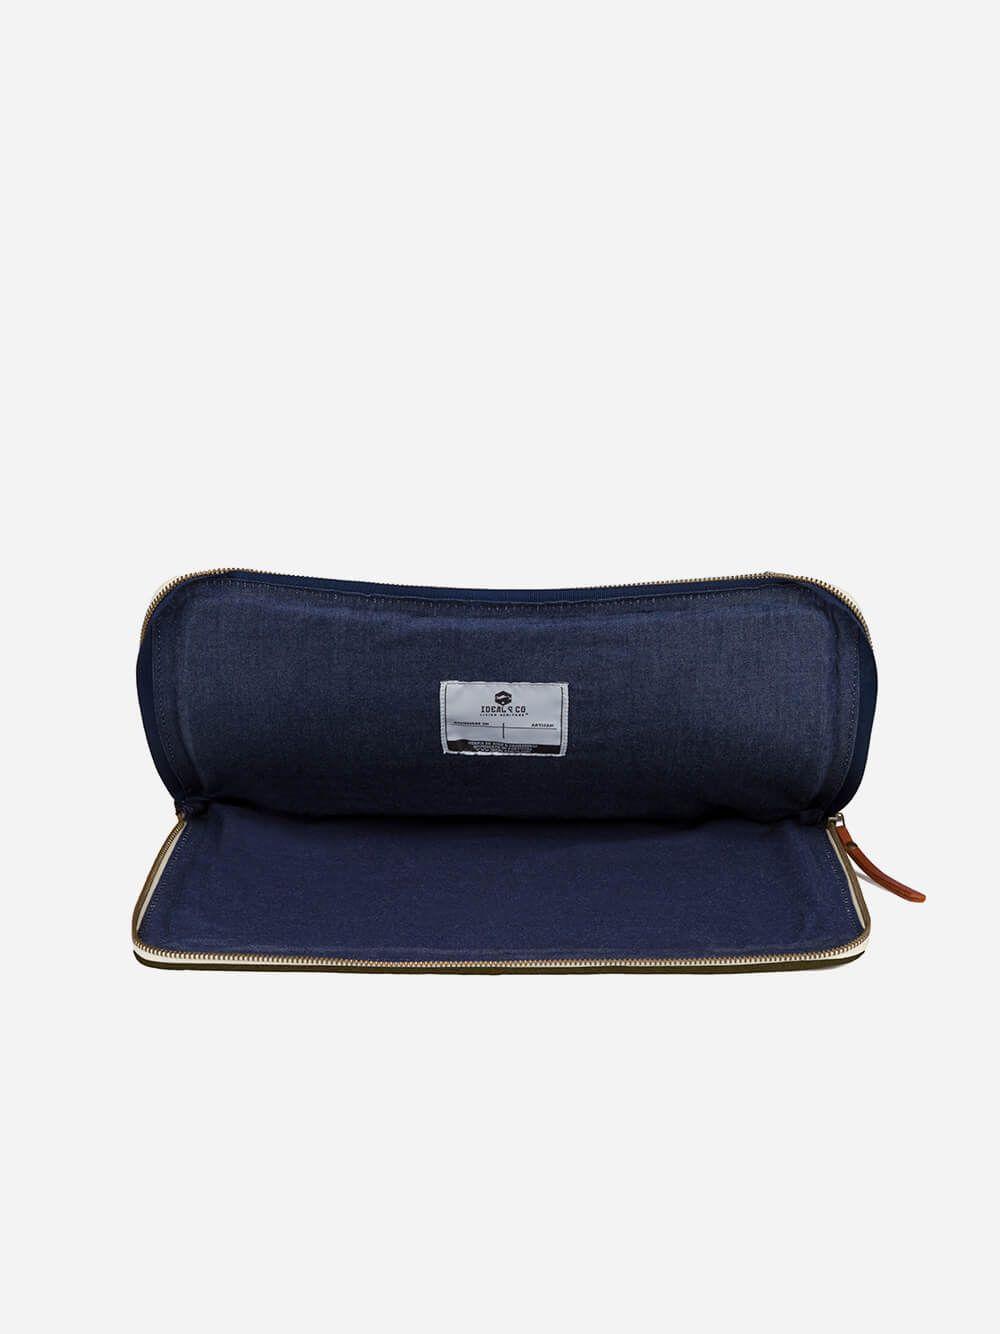 Dolinda Green Tablet-Laptop Sleeve II   Ideal & Co